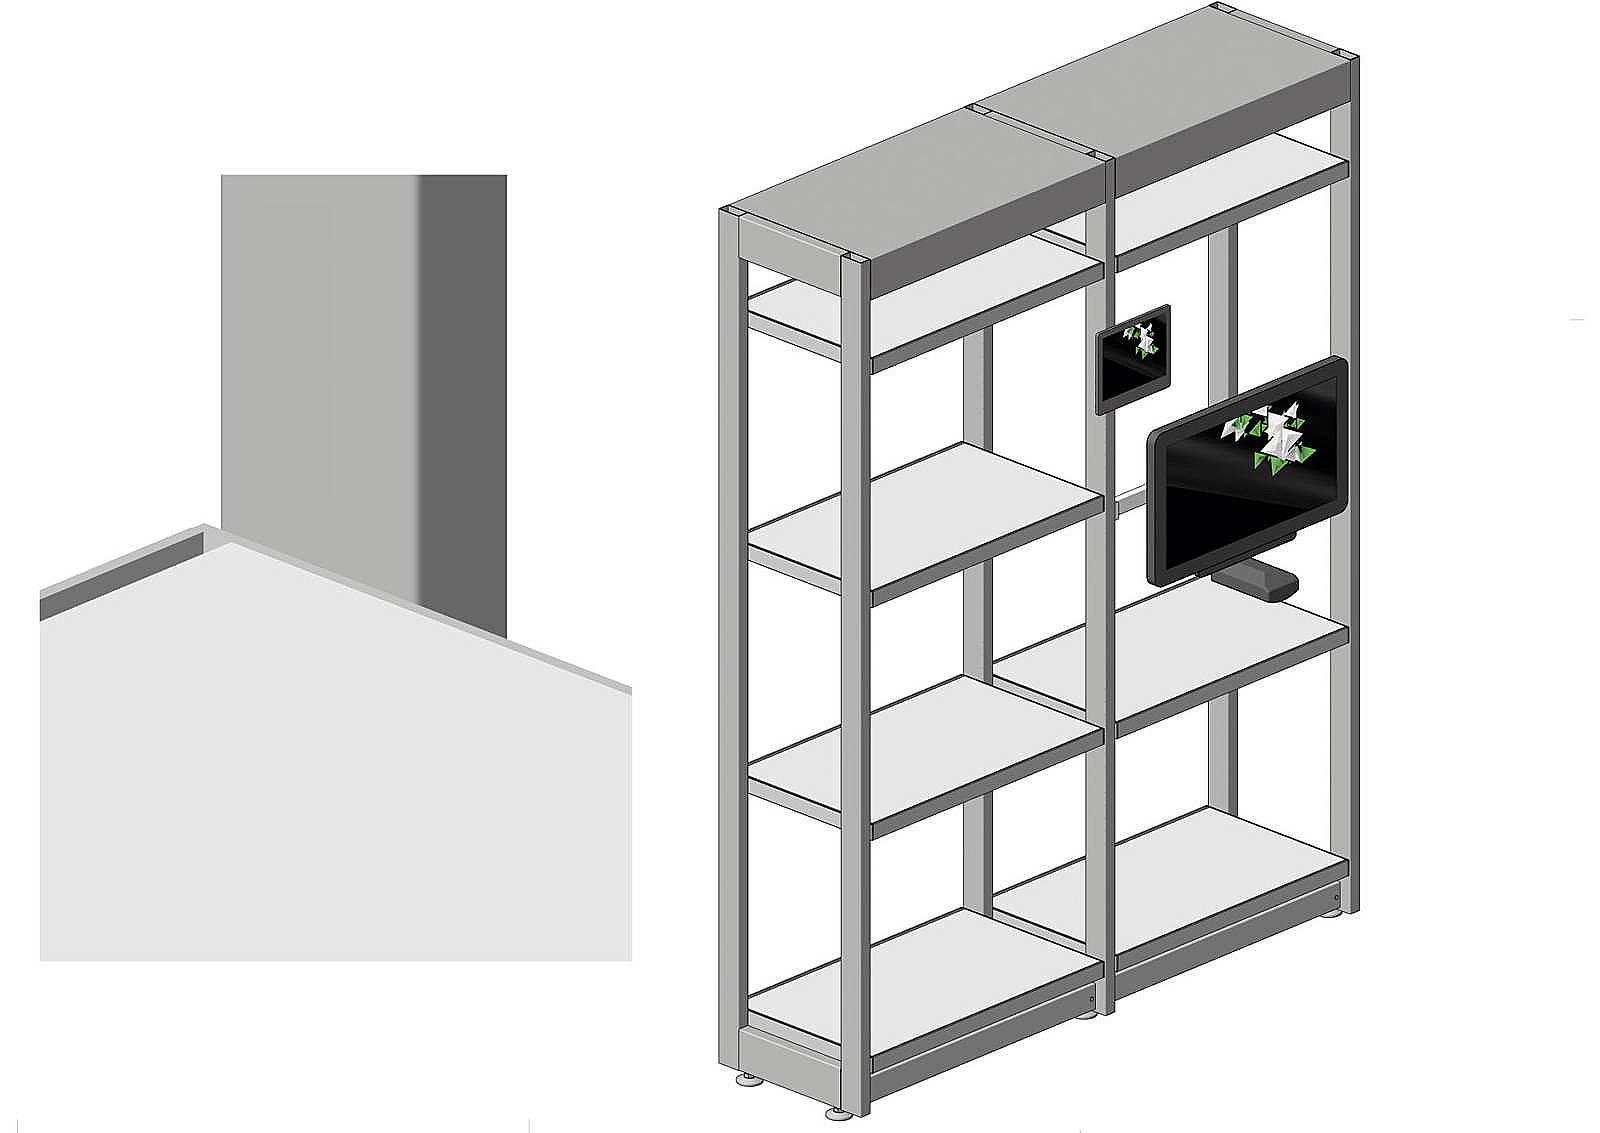 System step - KRAISS systems